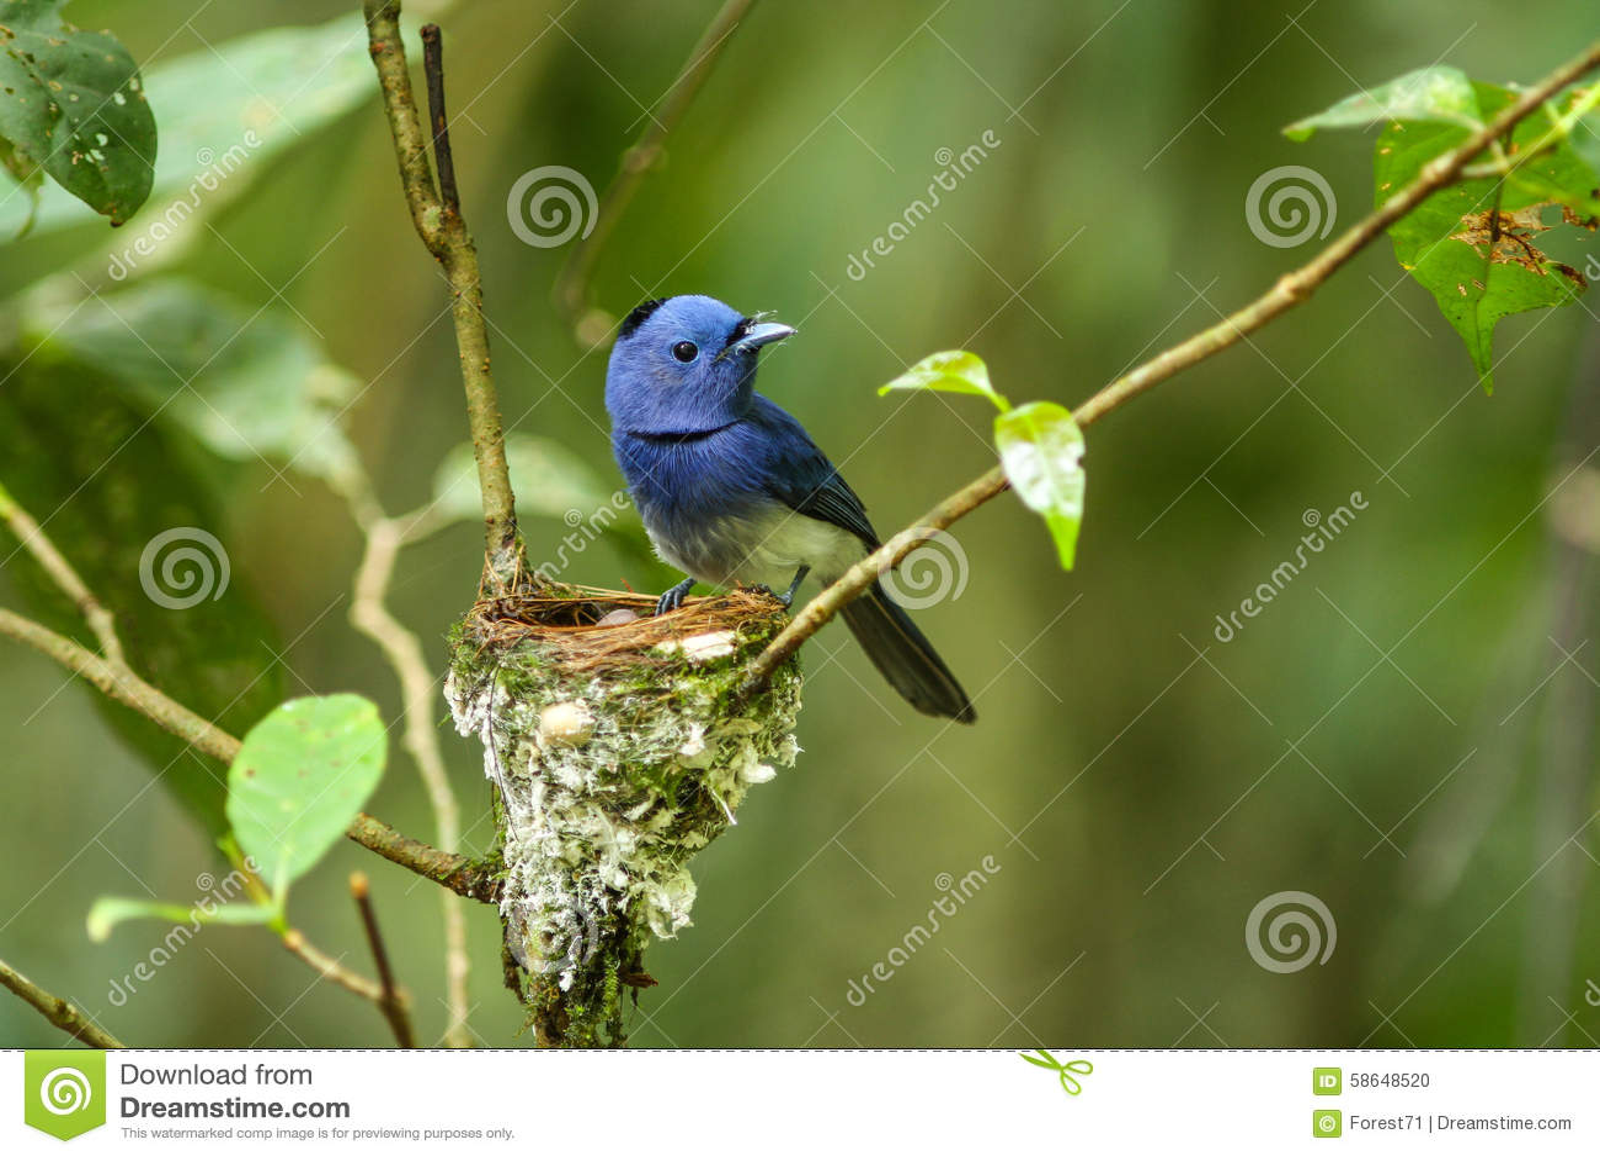 Black-naped monarch (Hypothymis azurea) bird in nature.